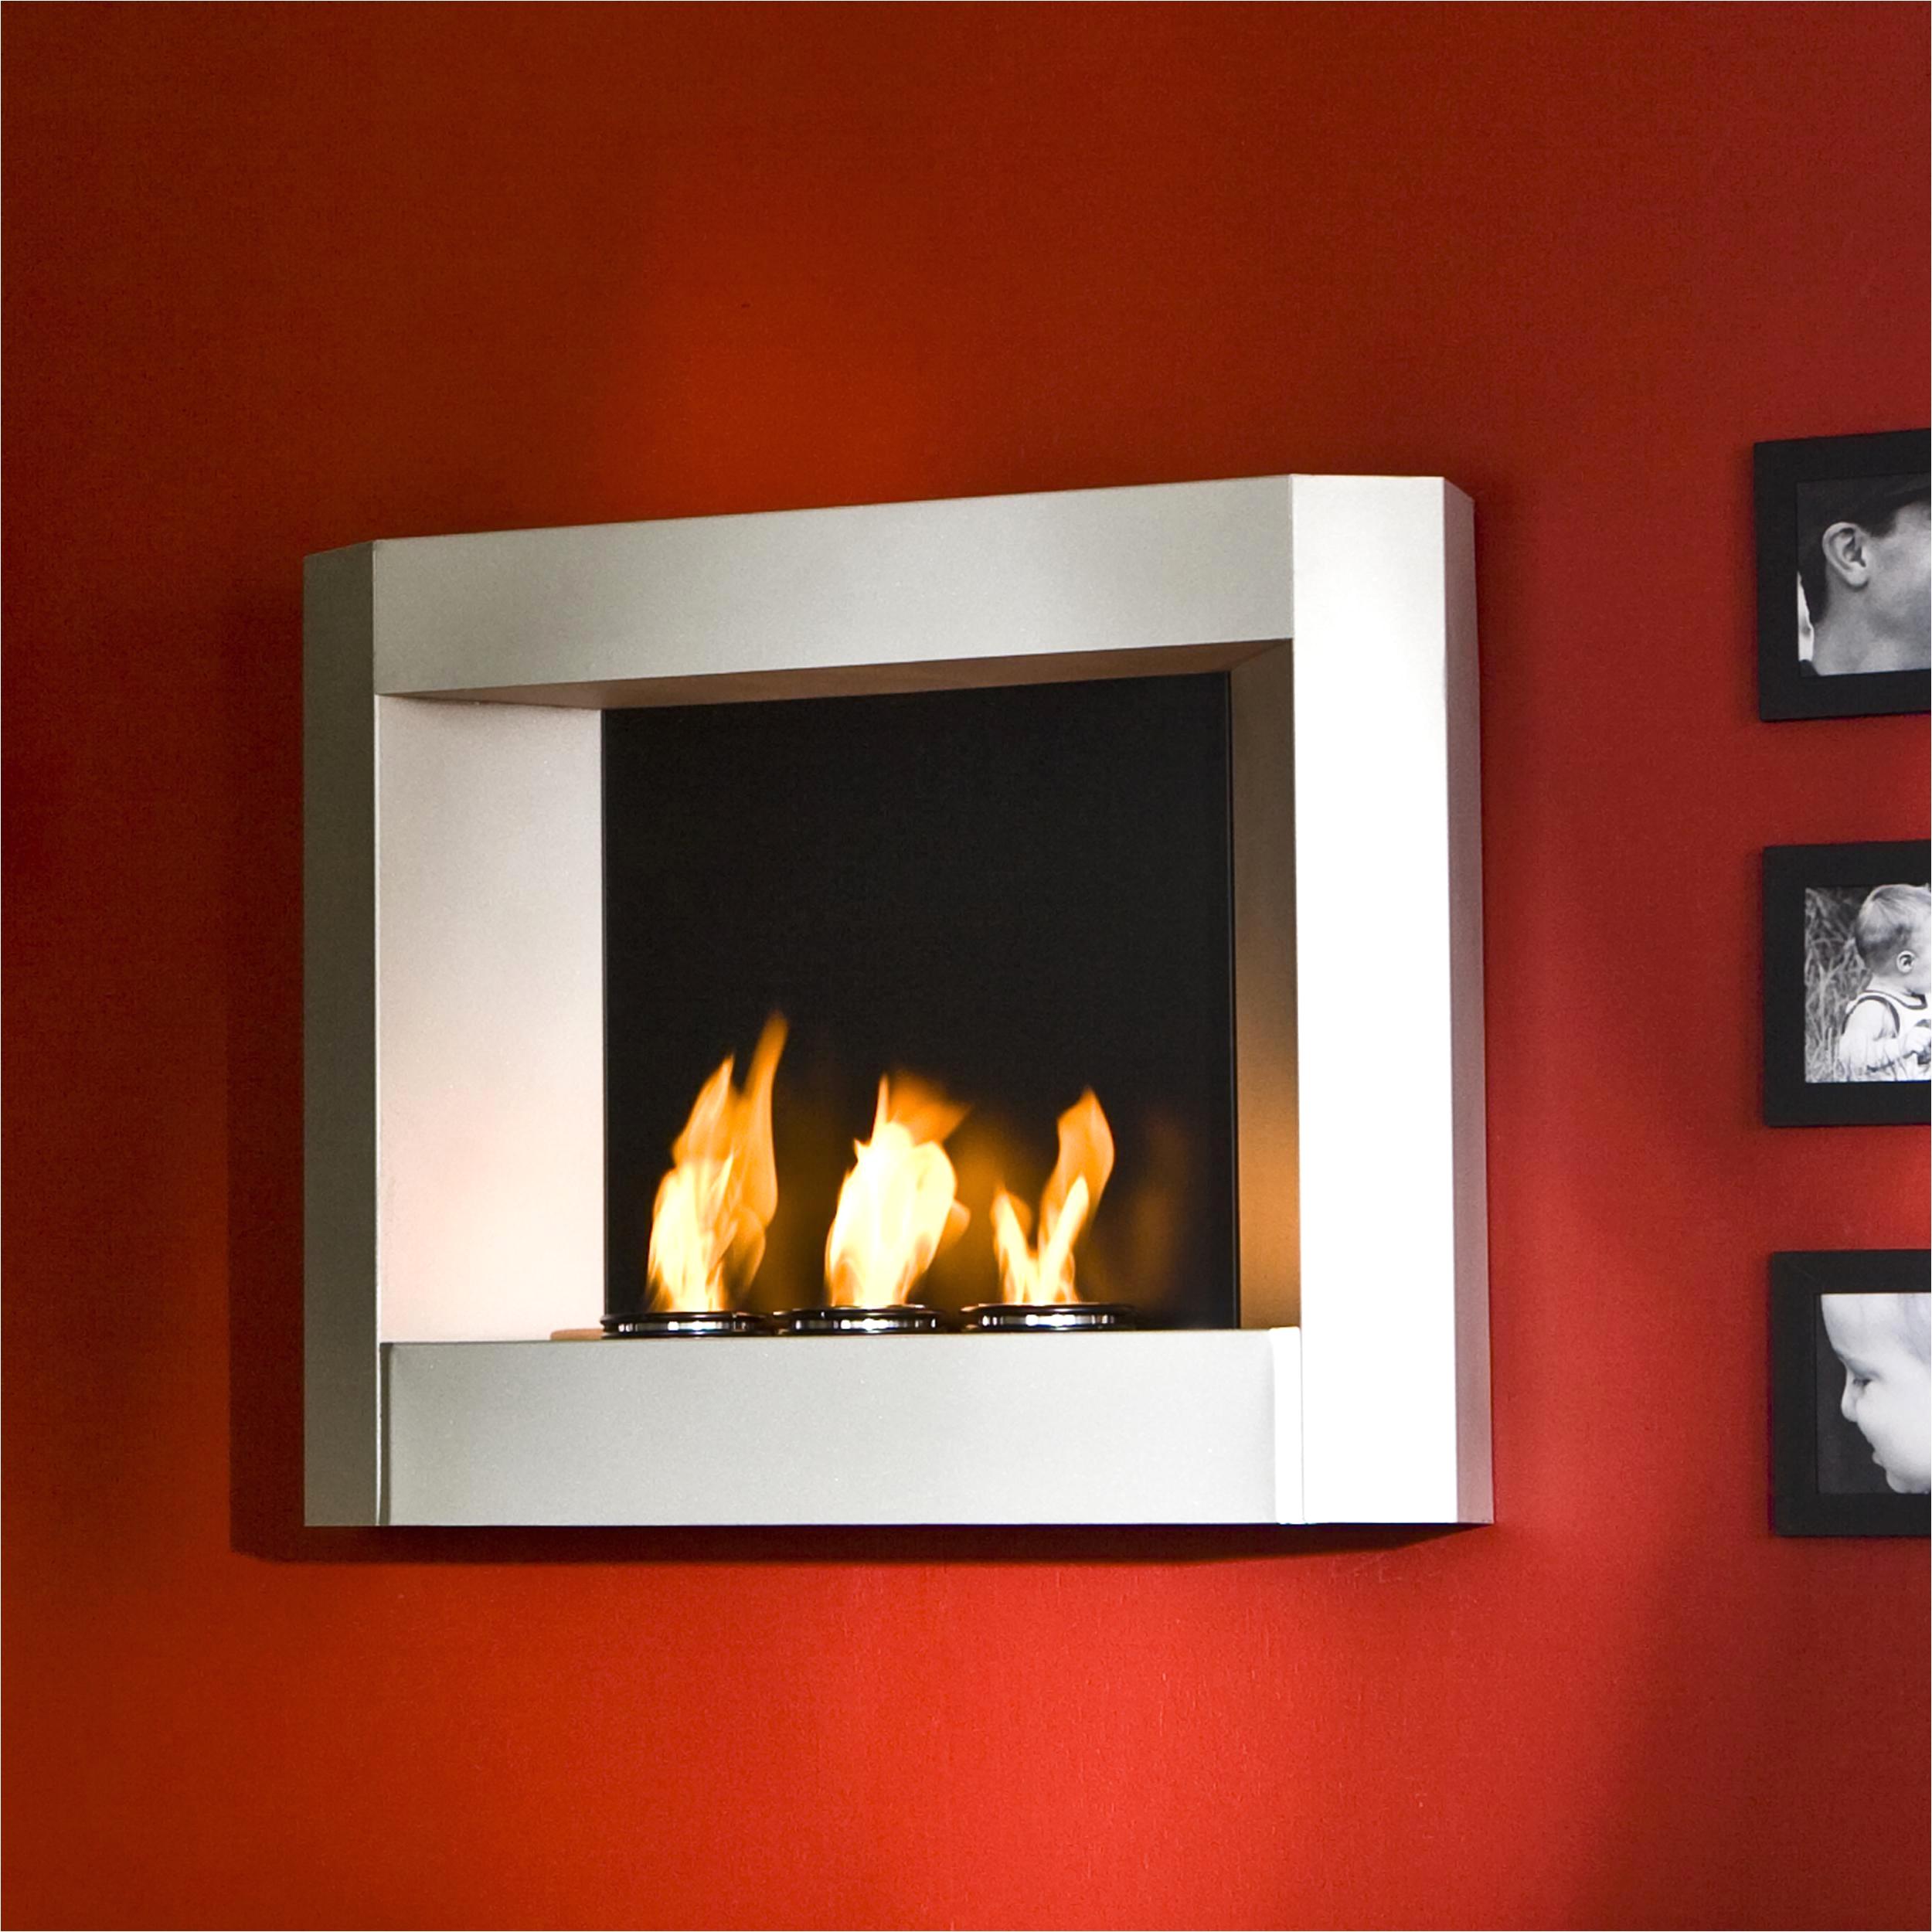 Wall Mounted Gel Fuel Fireplace 25 Lovely Wall Mounted Gel Fueled Fireplace Aftu